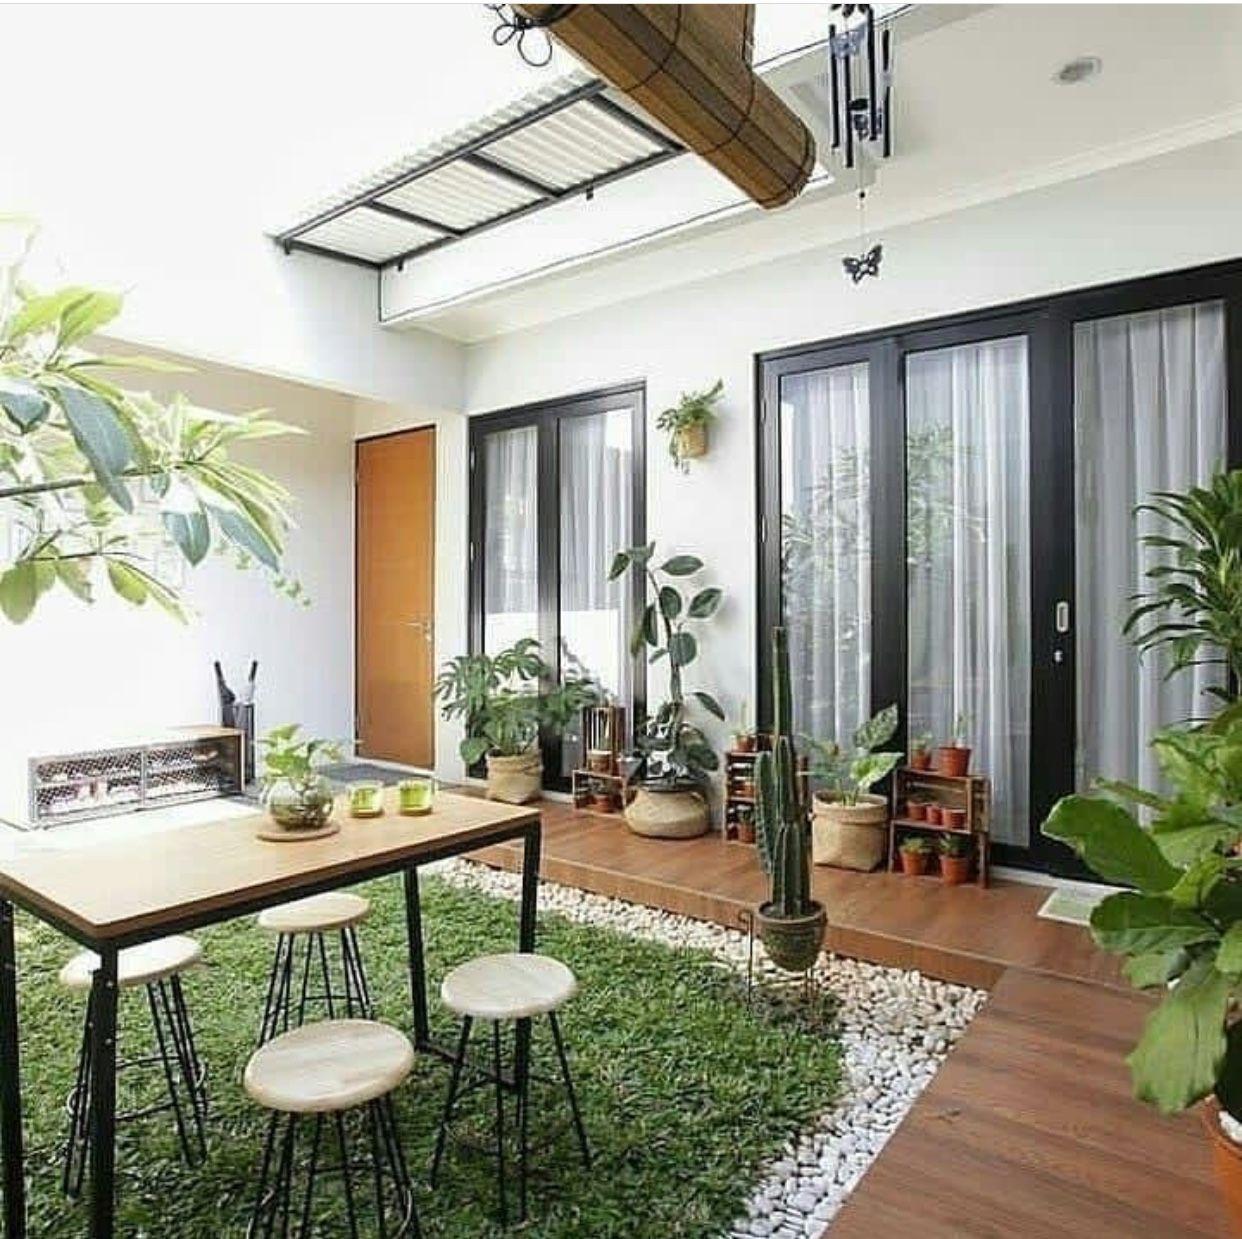 49+ Home garden living room ideas info